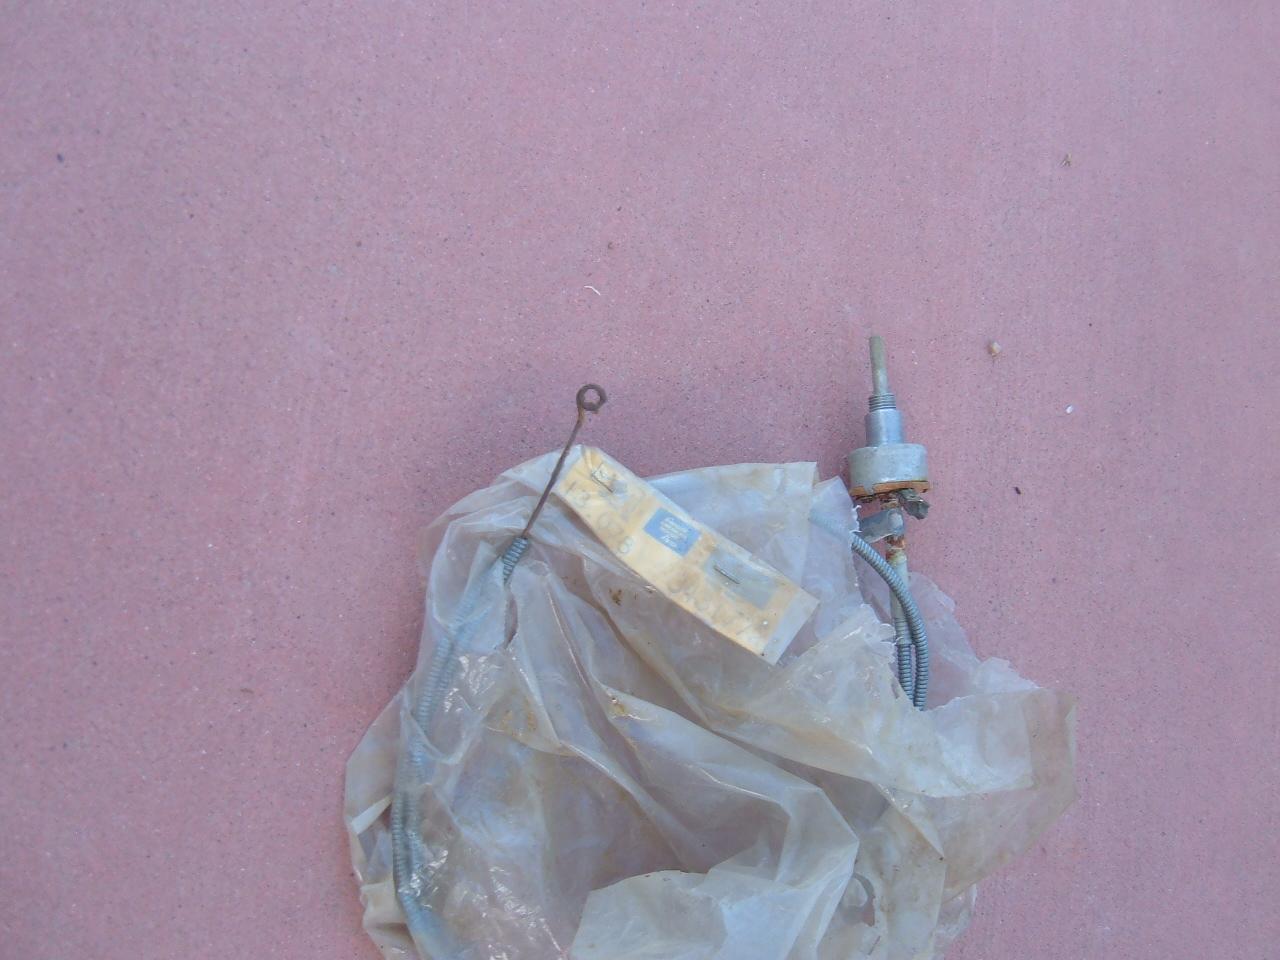 View Product1960 rambler american heater blower switch nos rambler 3431772 (z 3431772)